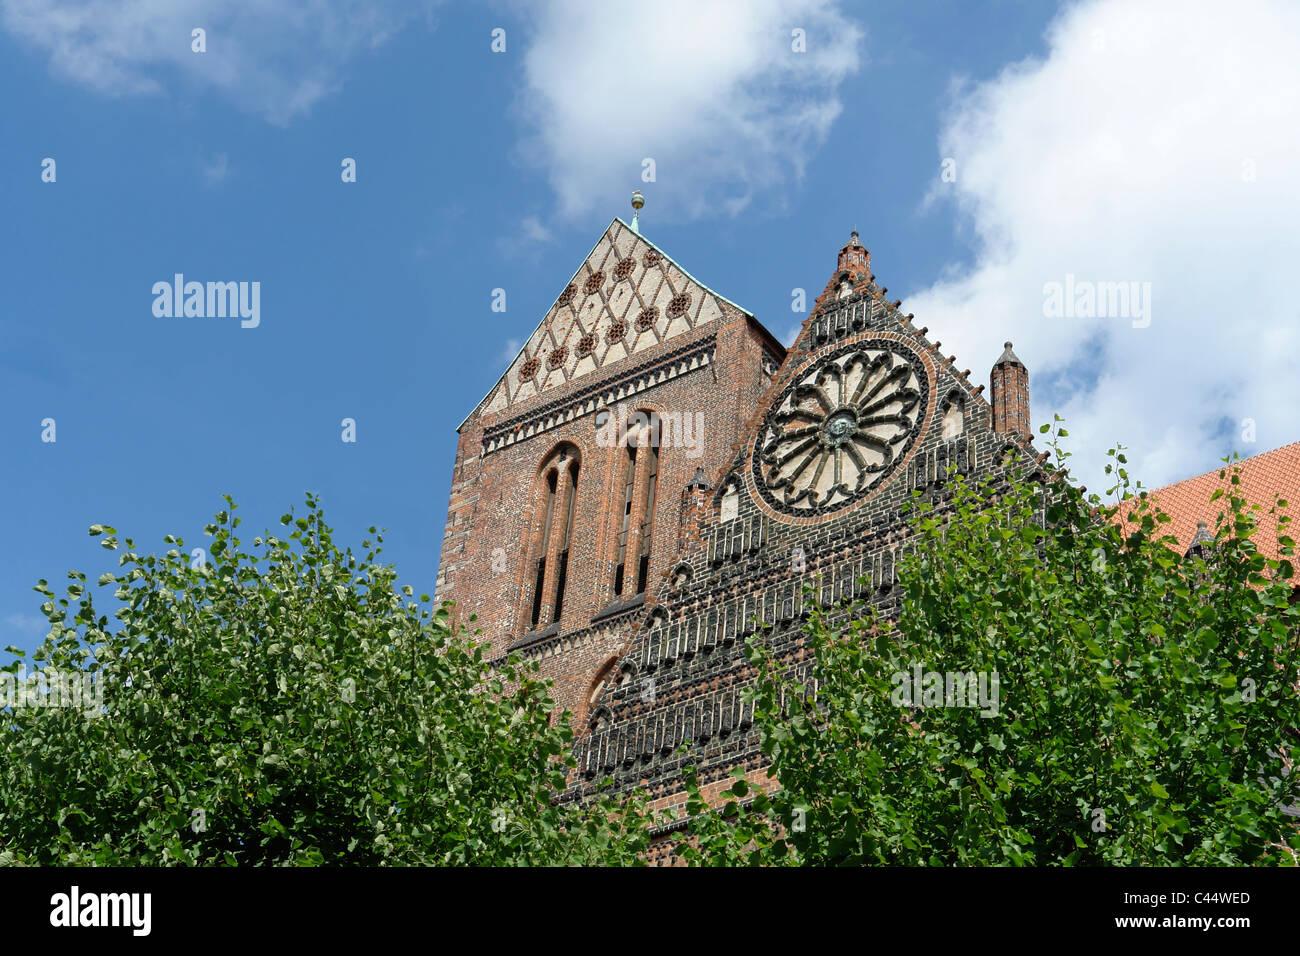 Germany, Mecklenburg-West Pomerania, Wismar, church, Saint Santa Clauses, trees, architecture, building, construction, - Stock Image